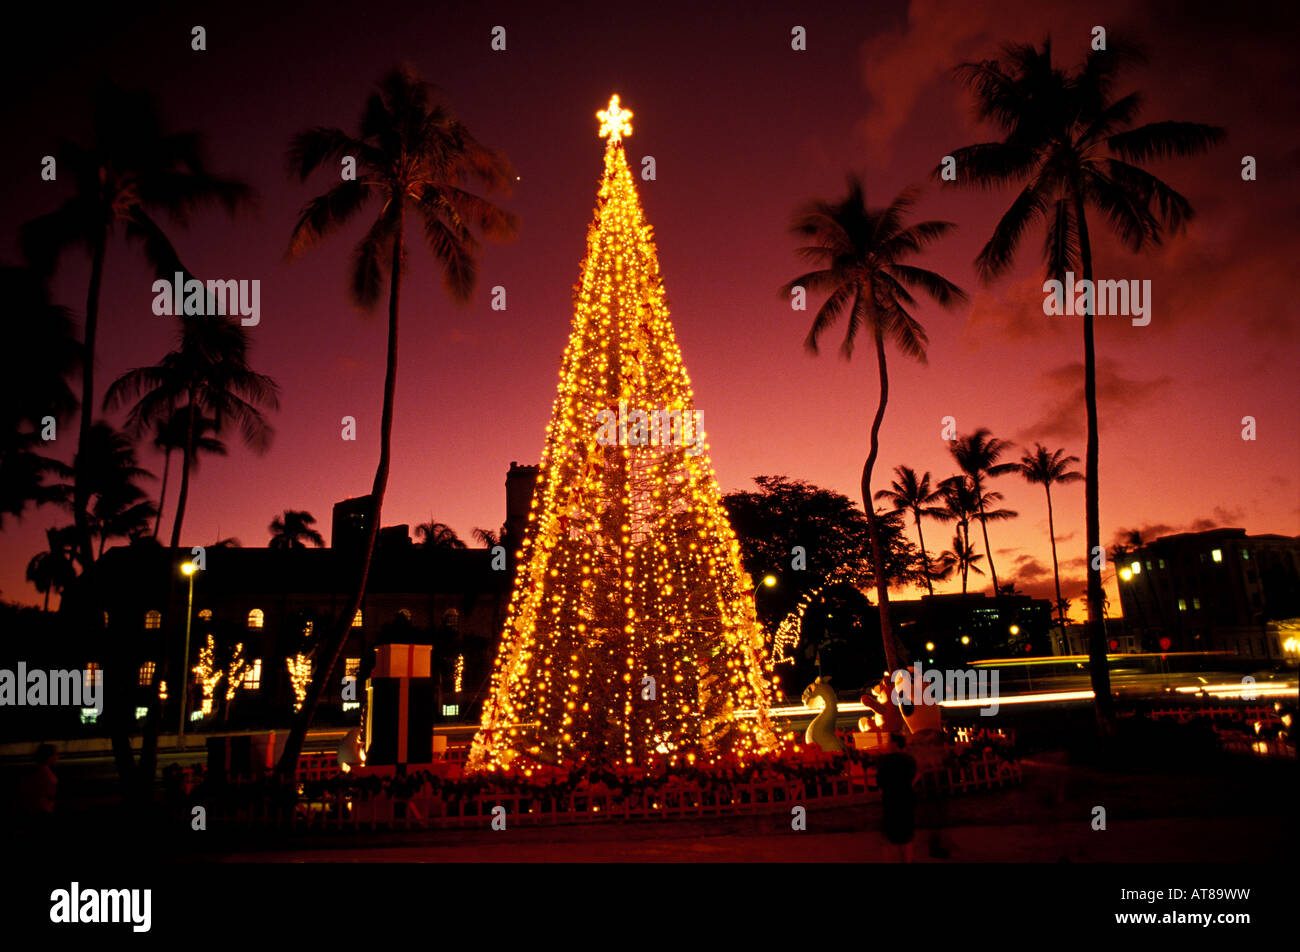 Honolulu Hale Christmas 2021 Christmas Tree At Twilight At Honolulu Hale With Pink Sky And Palm Trees Stock Photo Alamy